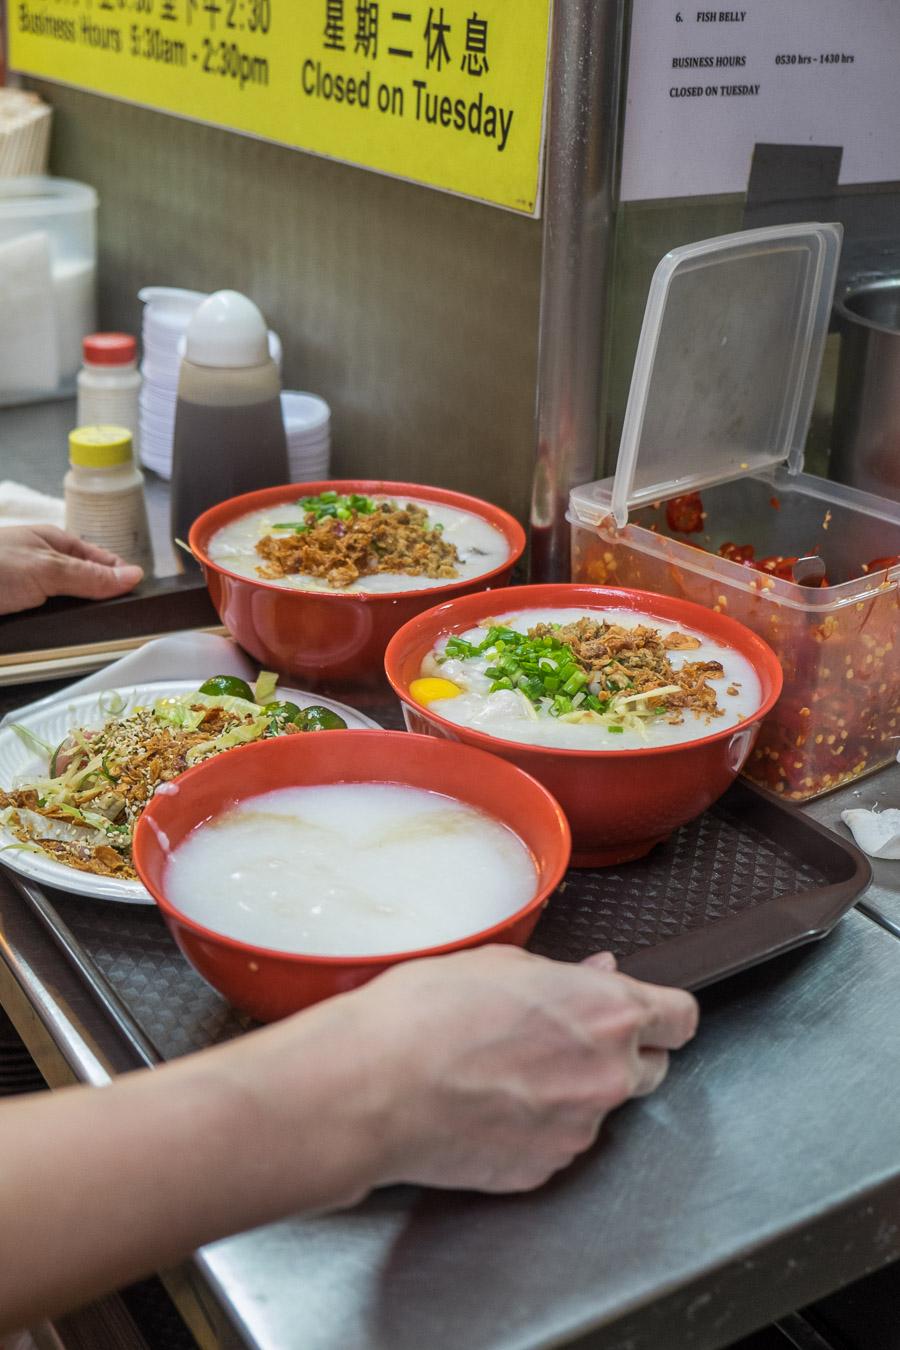 The standard order - porridge and yee sang